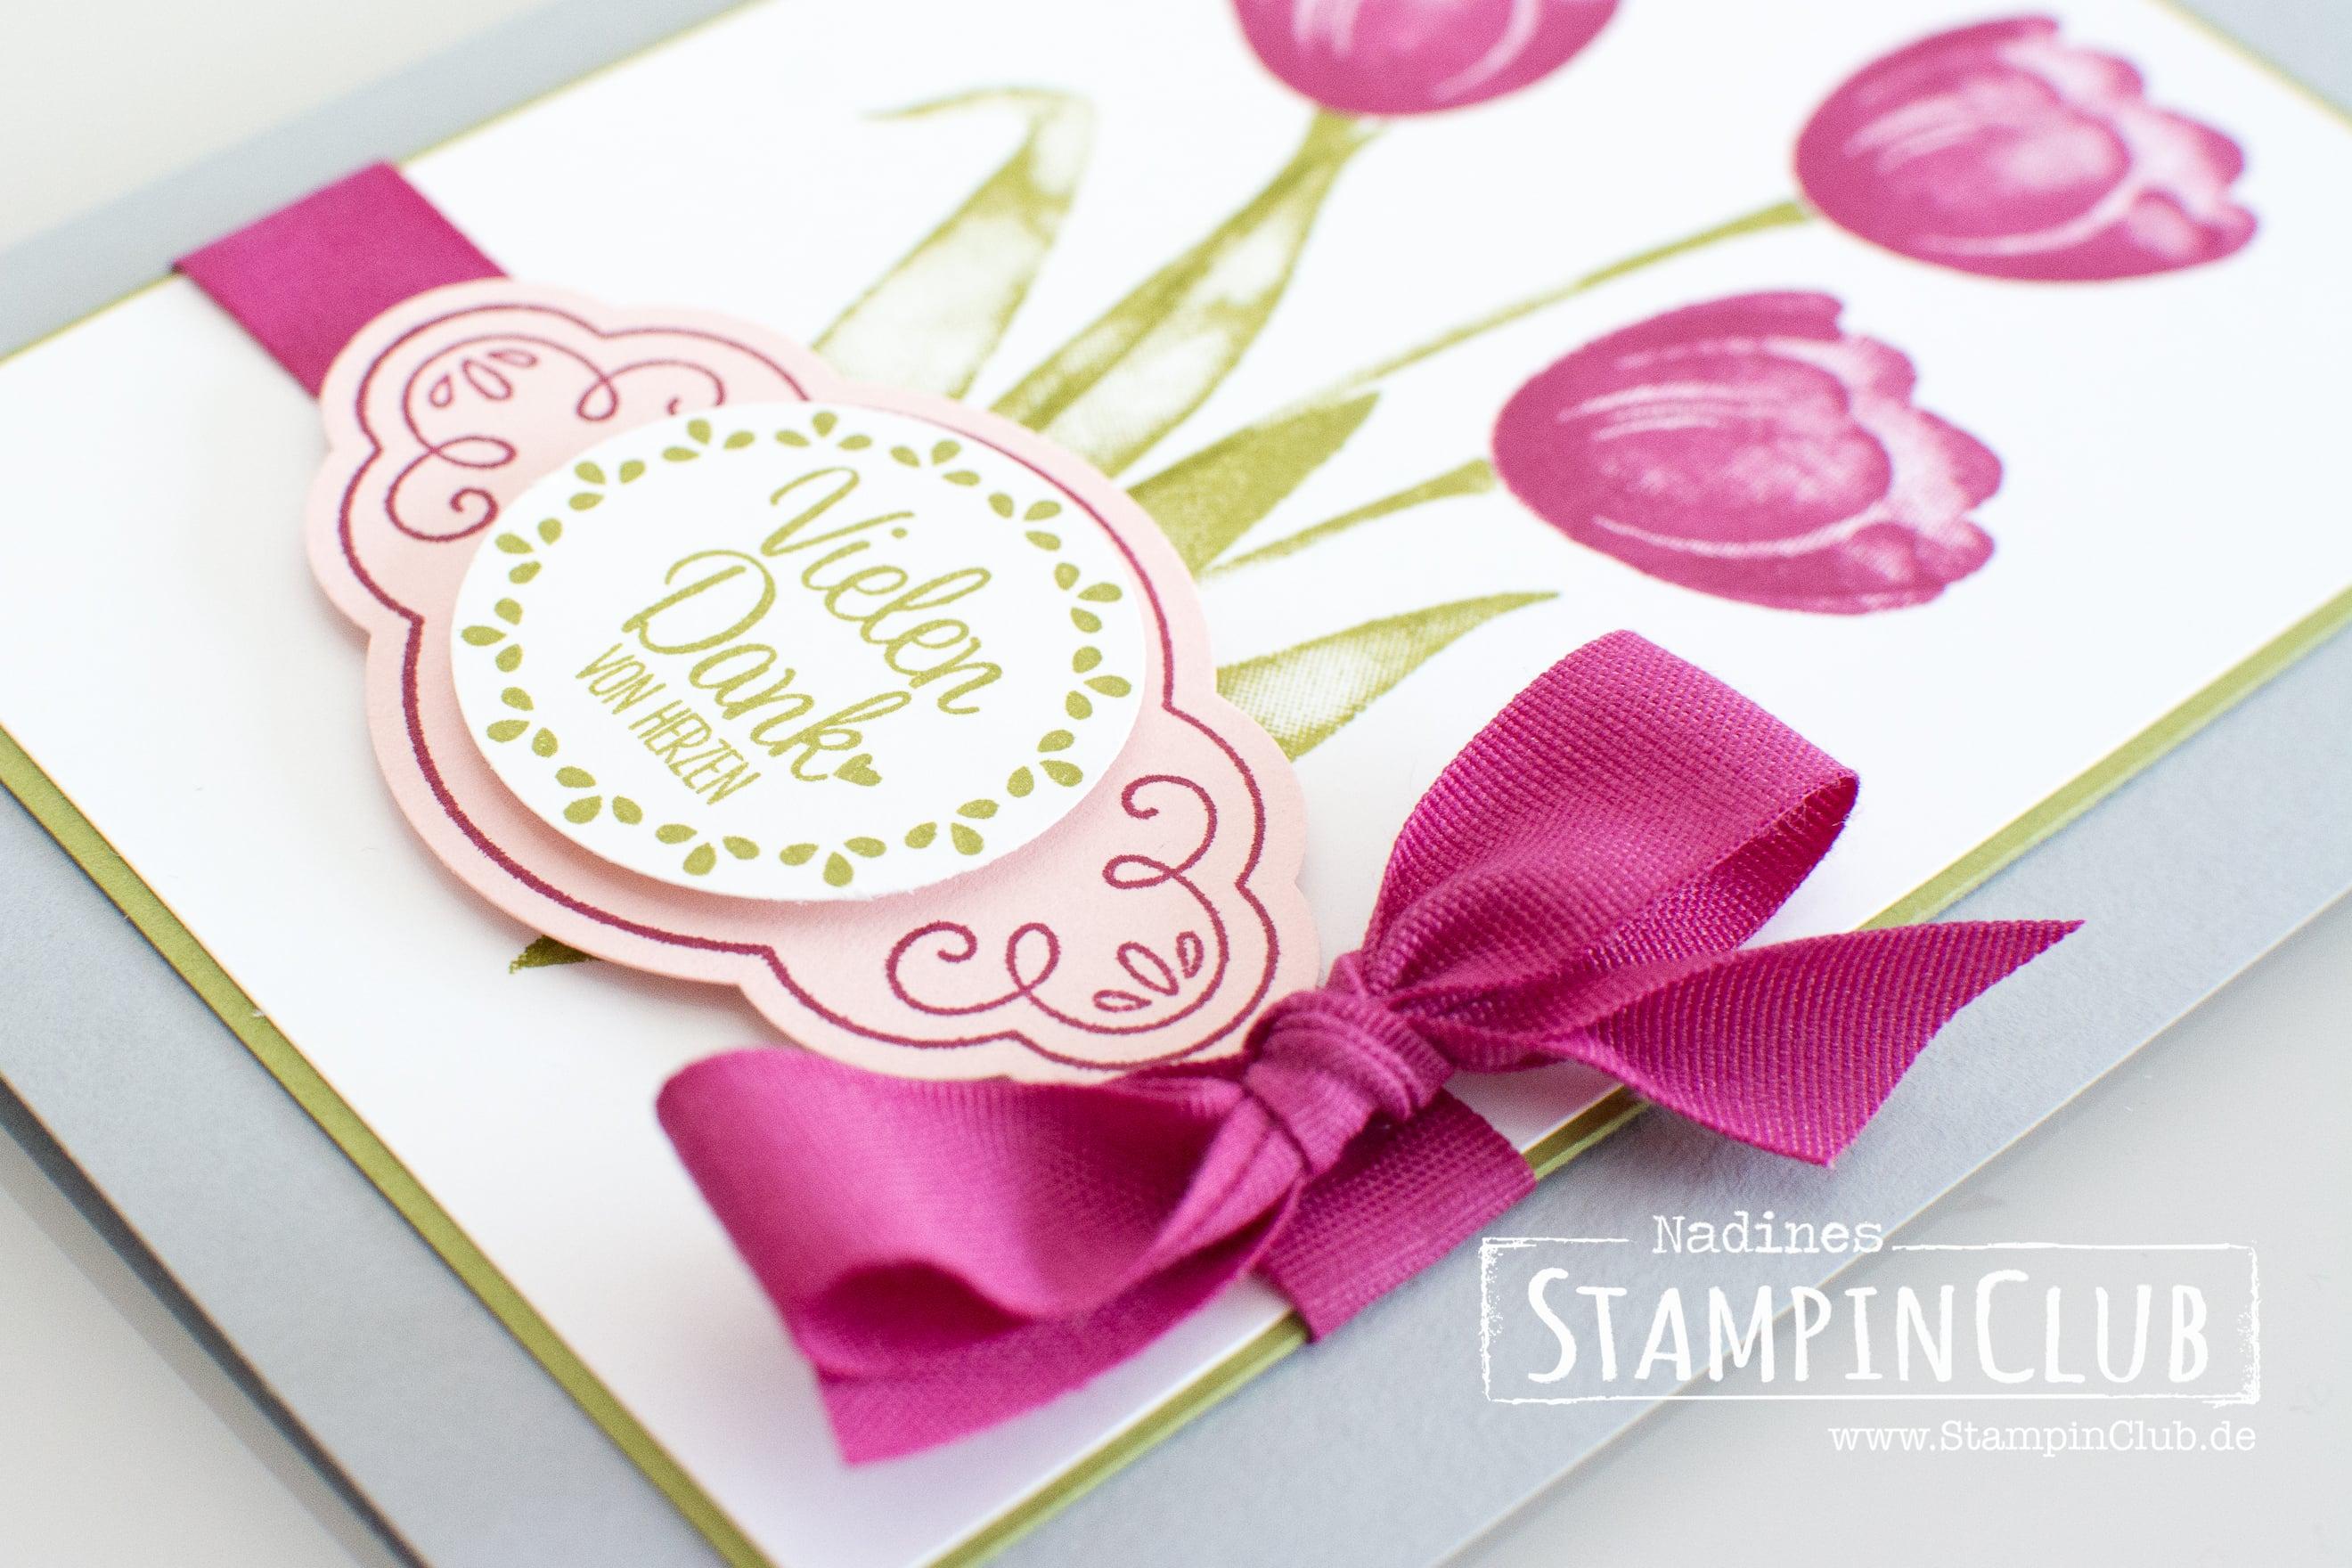 Stampin' Up!, StampinClub, Tranquil Tulips, Quartett fürs Etikett, Label me pretty